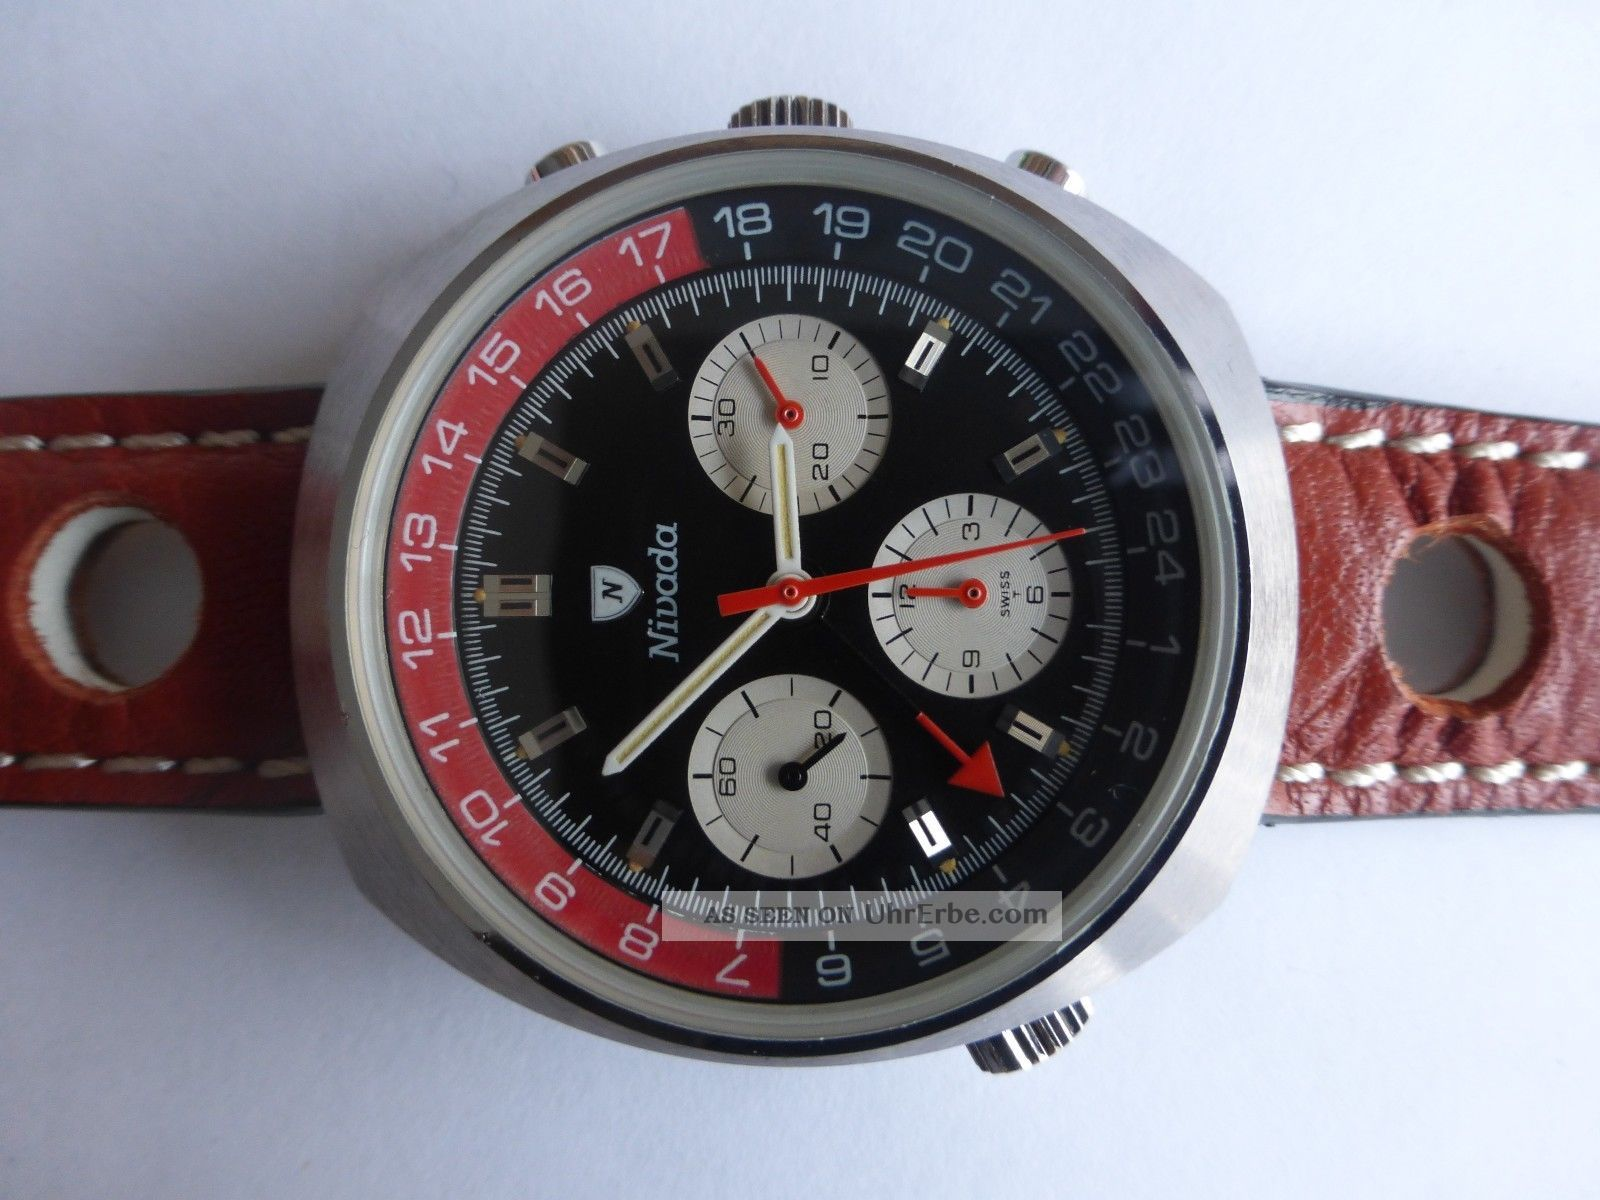 Nivada Chronograph Valjoux 724 Gmt Vintage Armbanduhren Bild